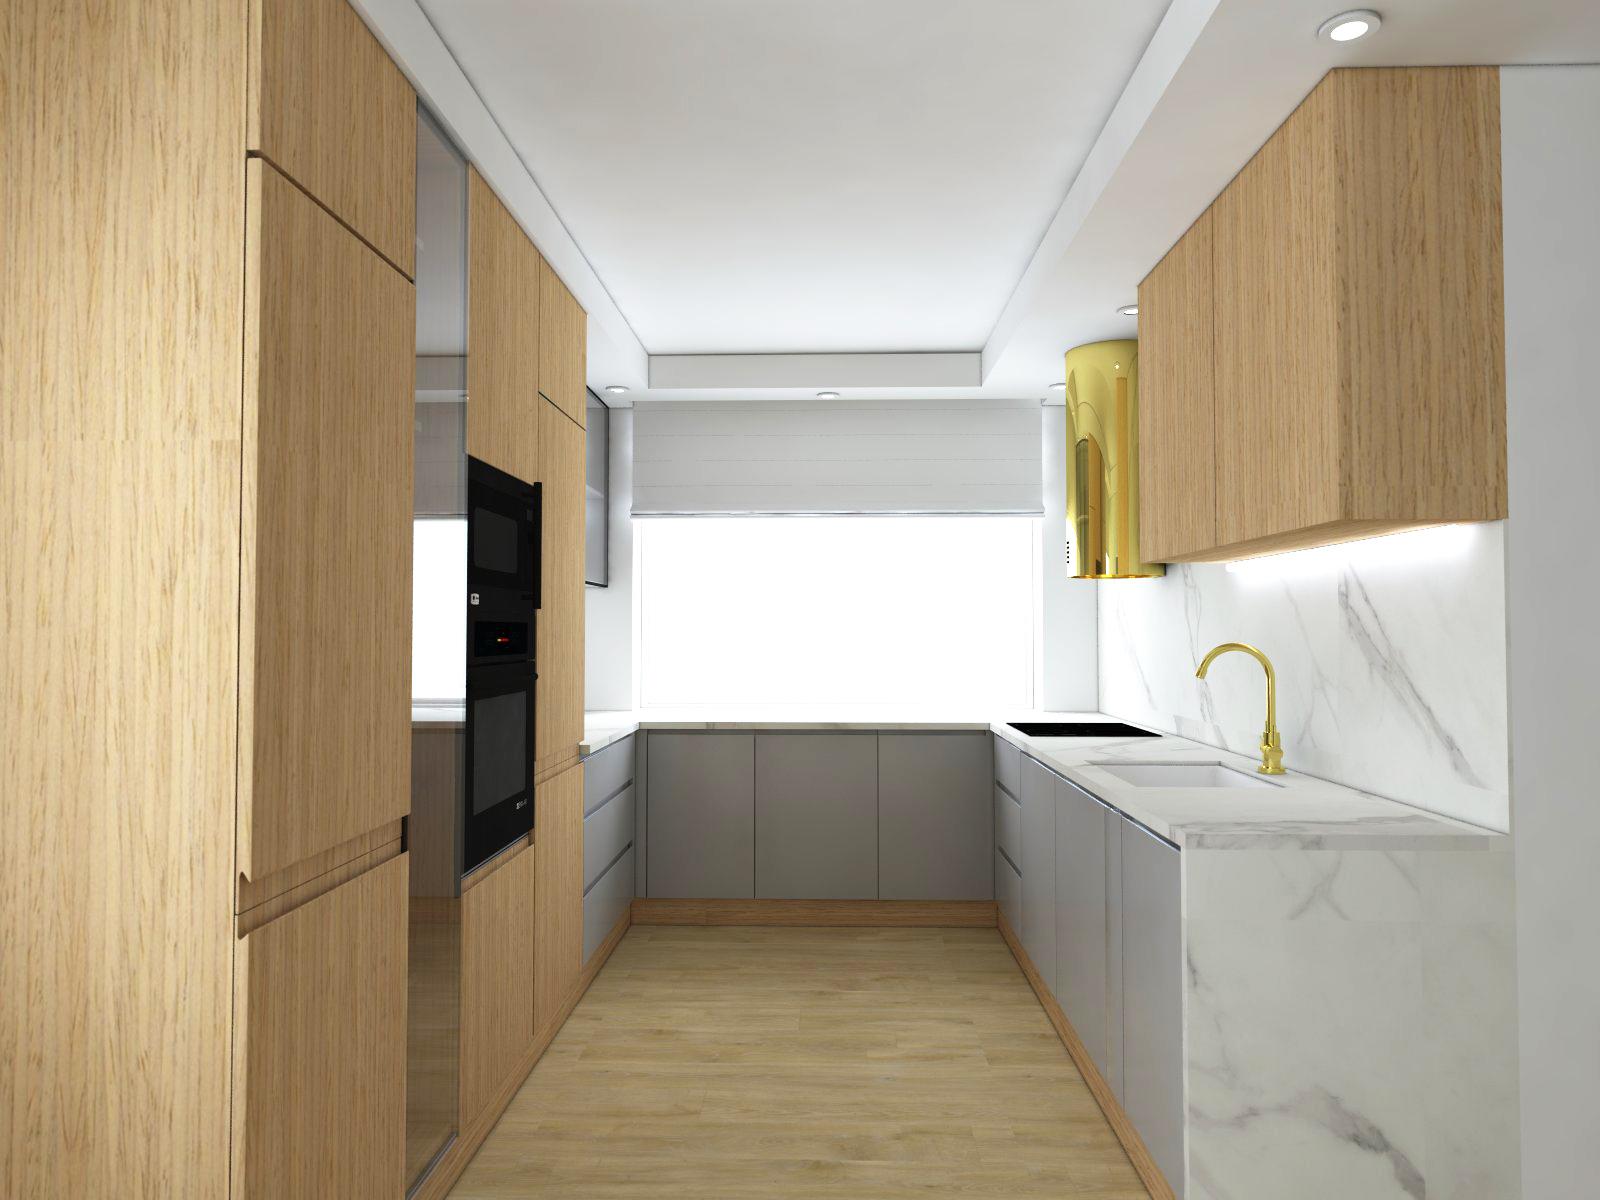 nowoczesna kuchnia szara z drewnem